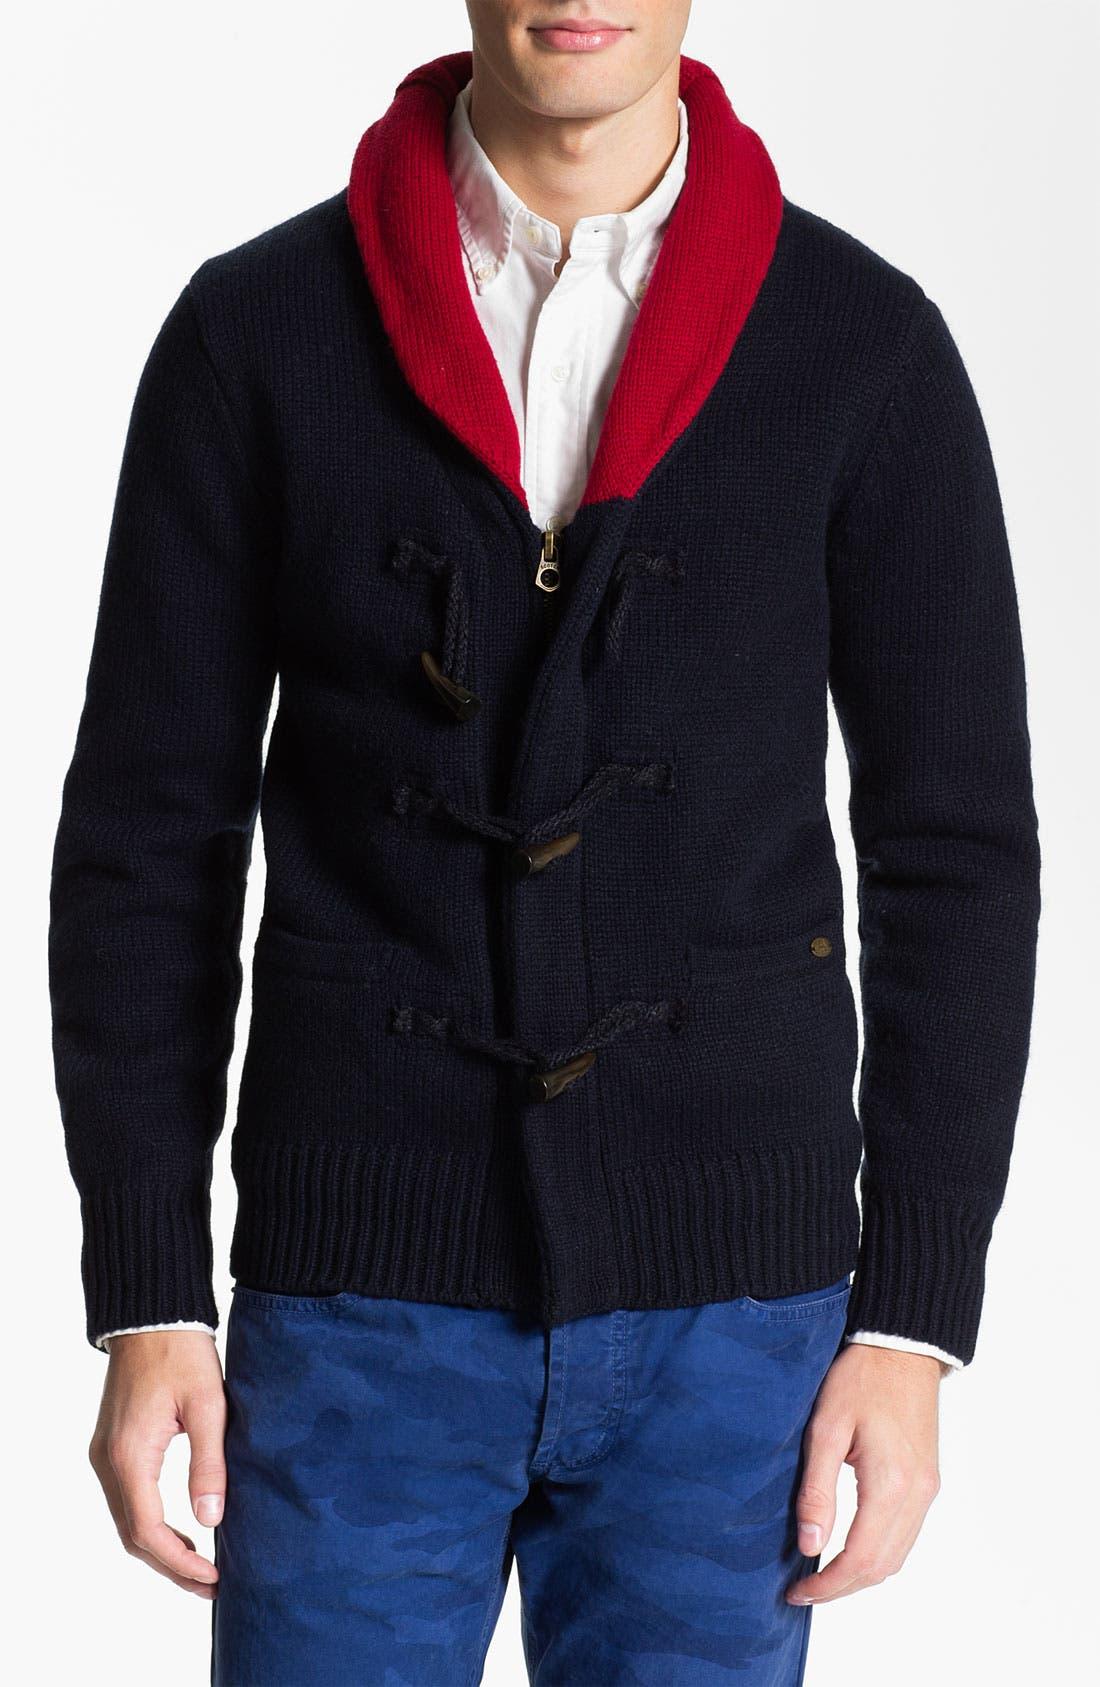 Alternate Image 1 Selected - Scotch & Soda Shawl Collar Wool Blend Cardigan